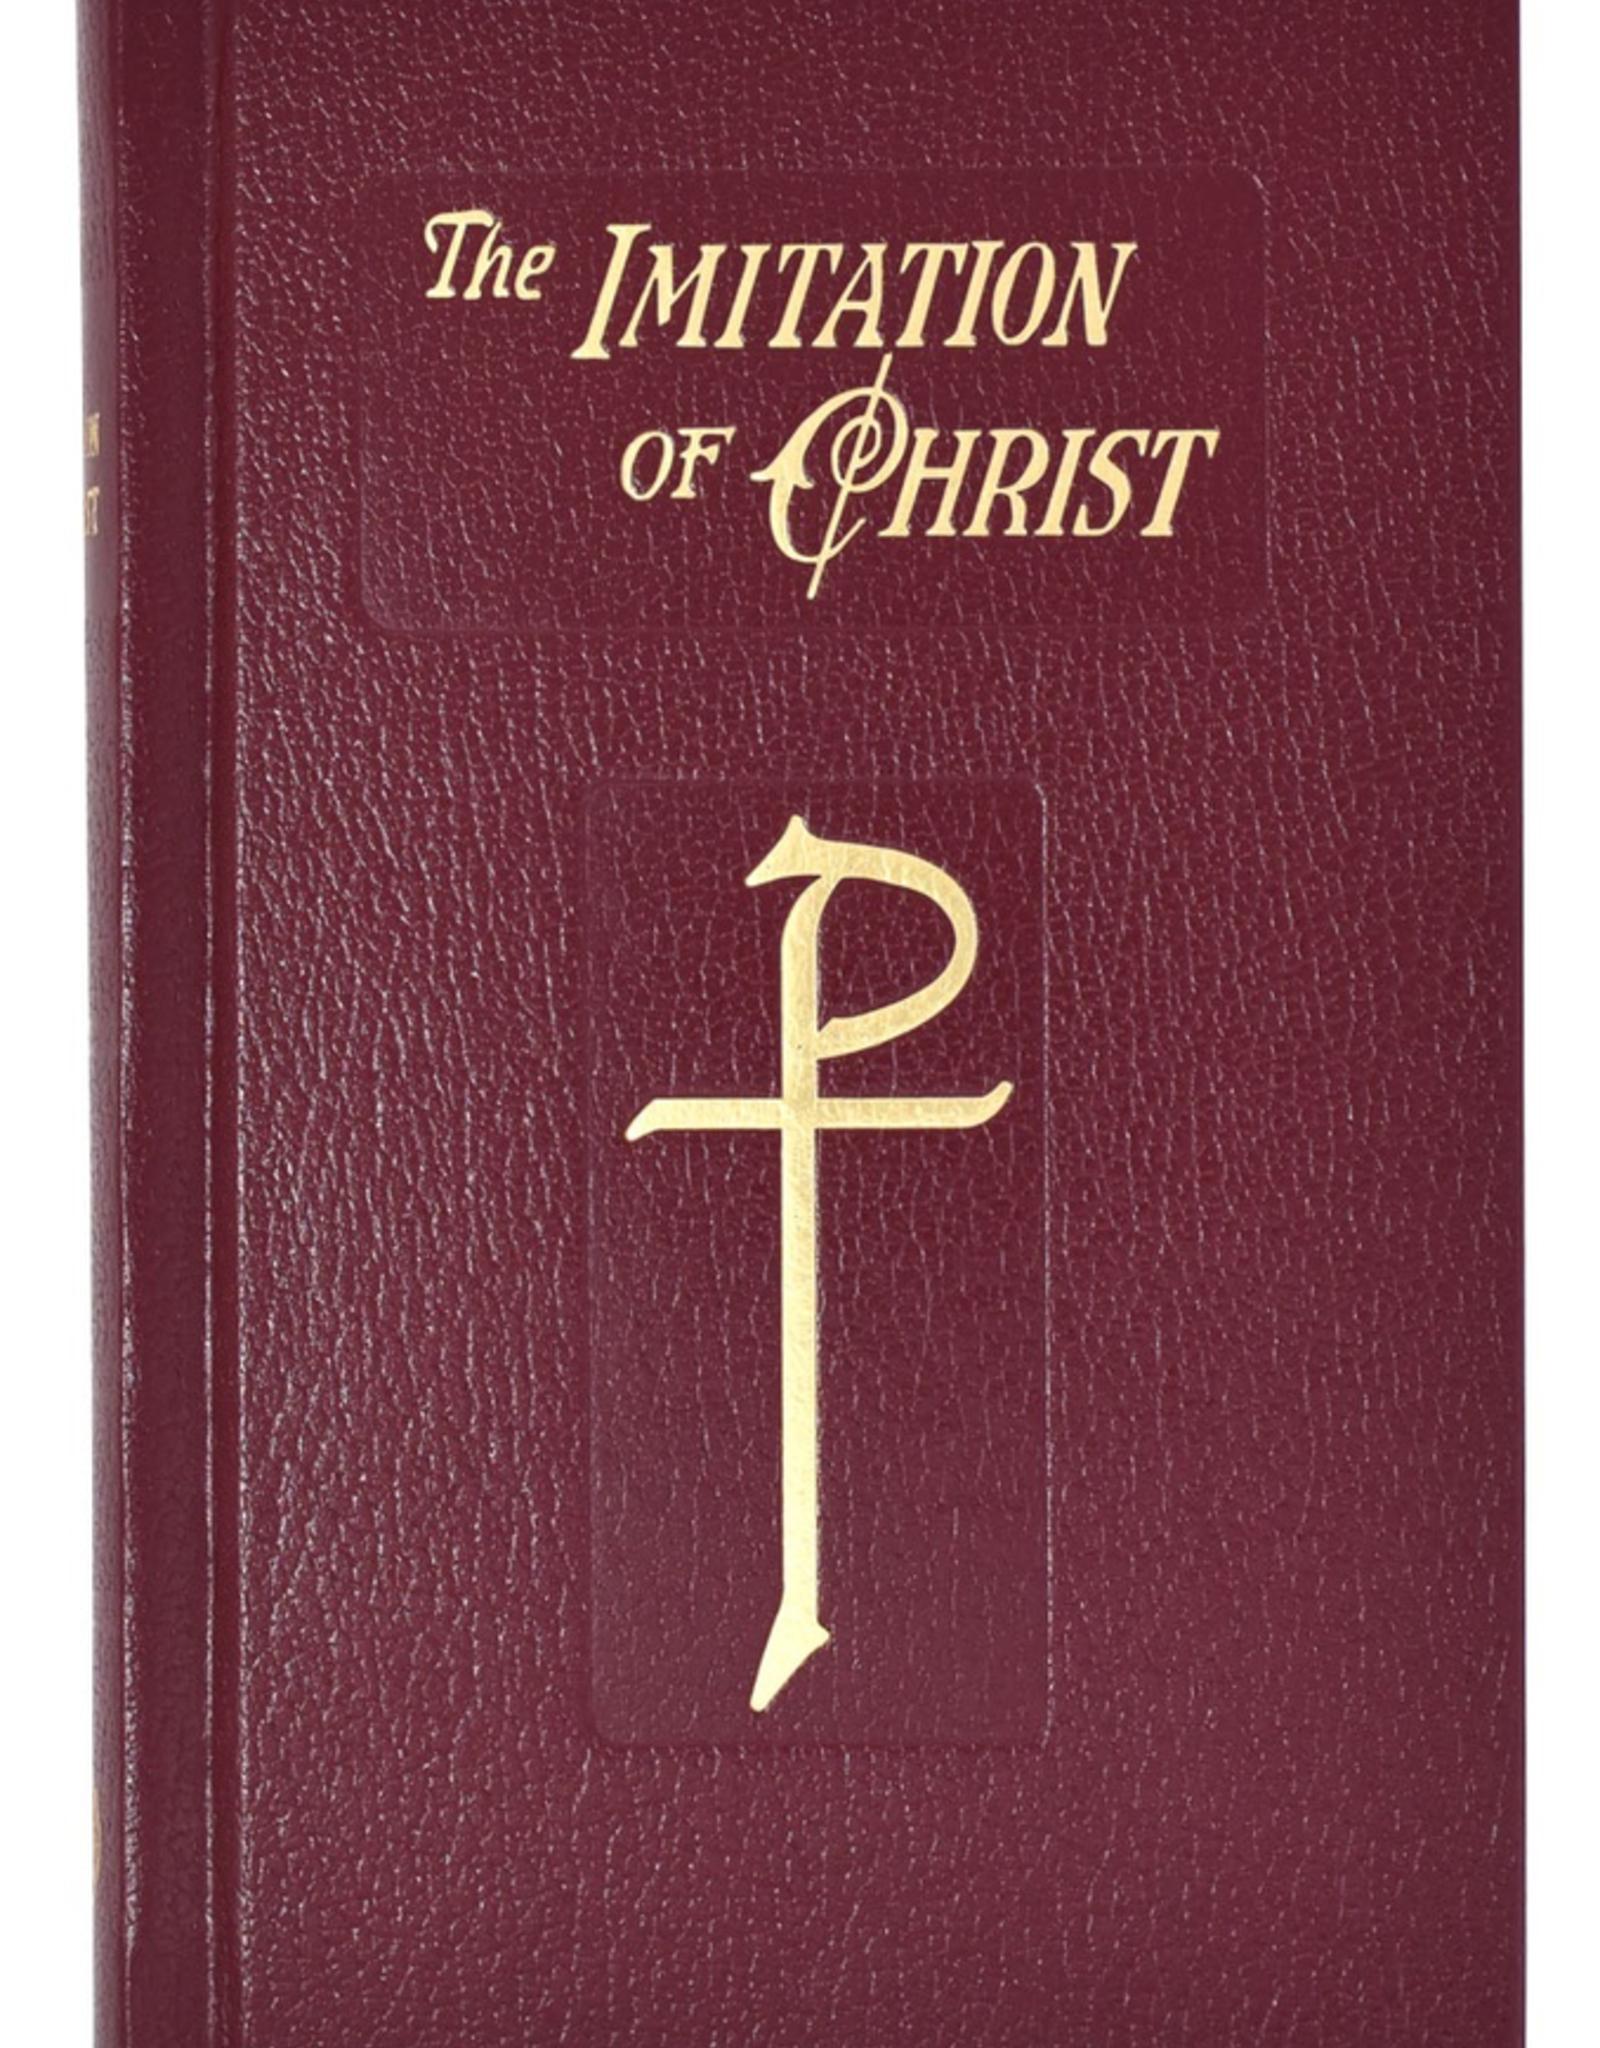 Catholic Book Publishing The Imitation of Christ, by Thomas A Kempis